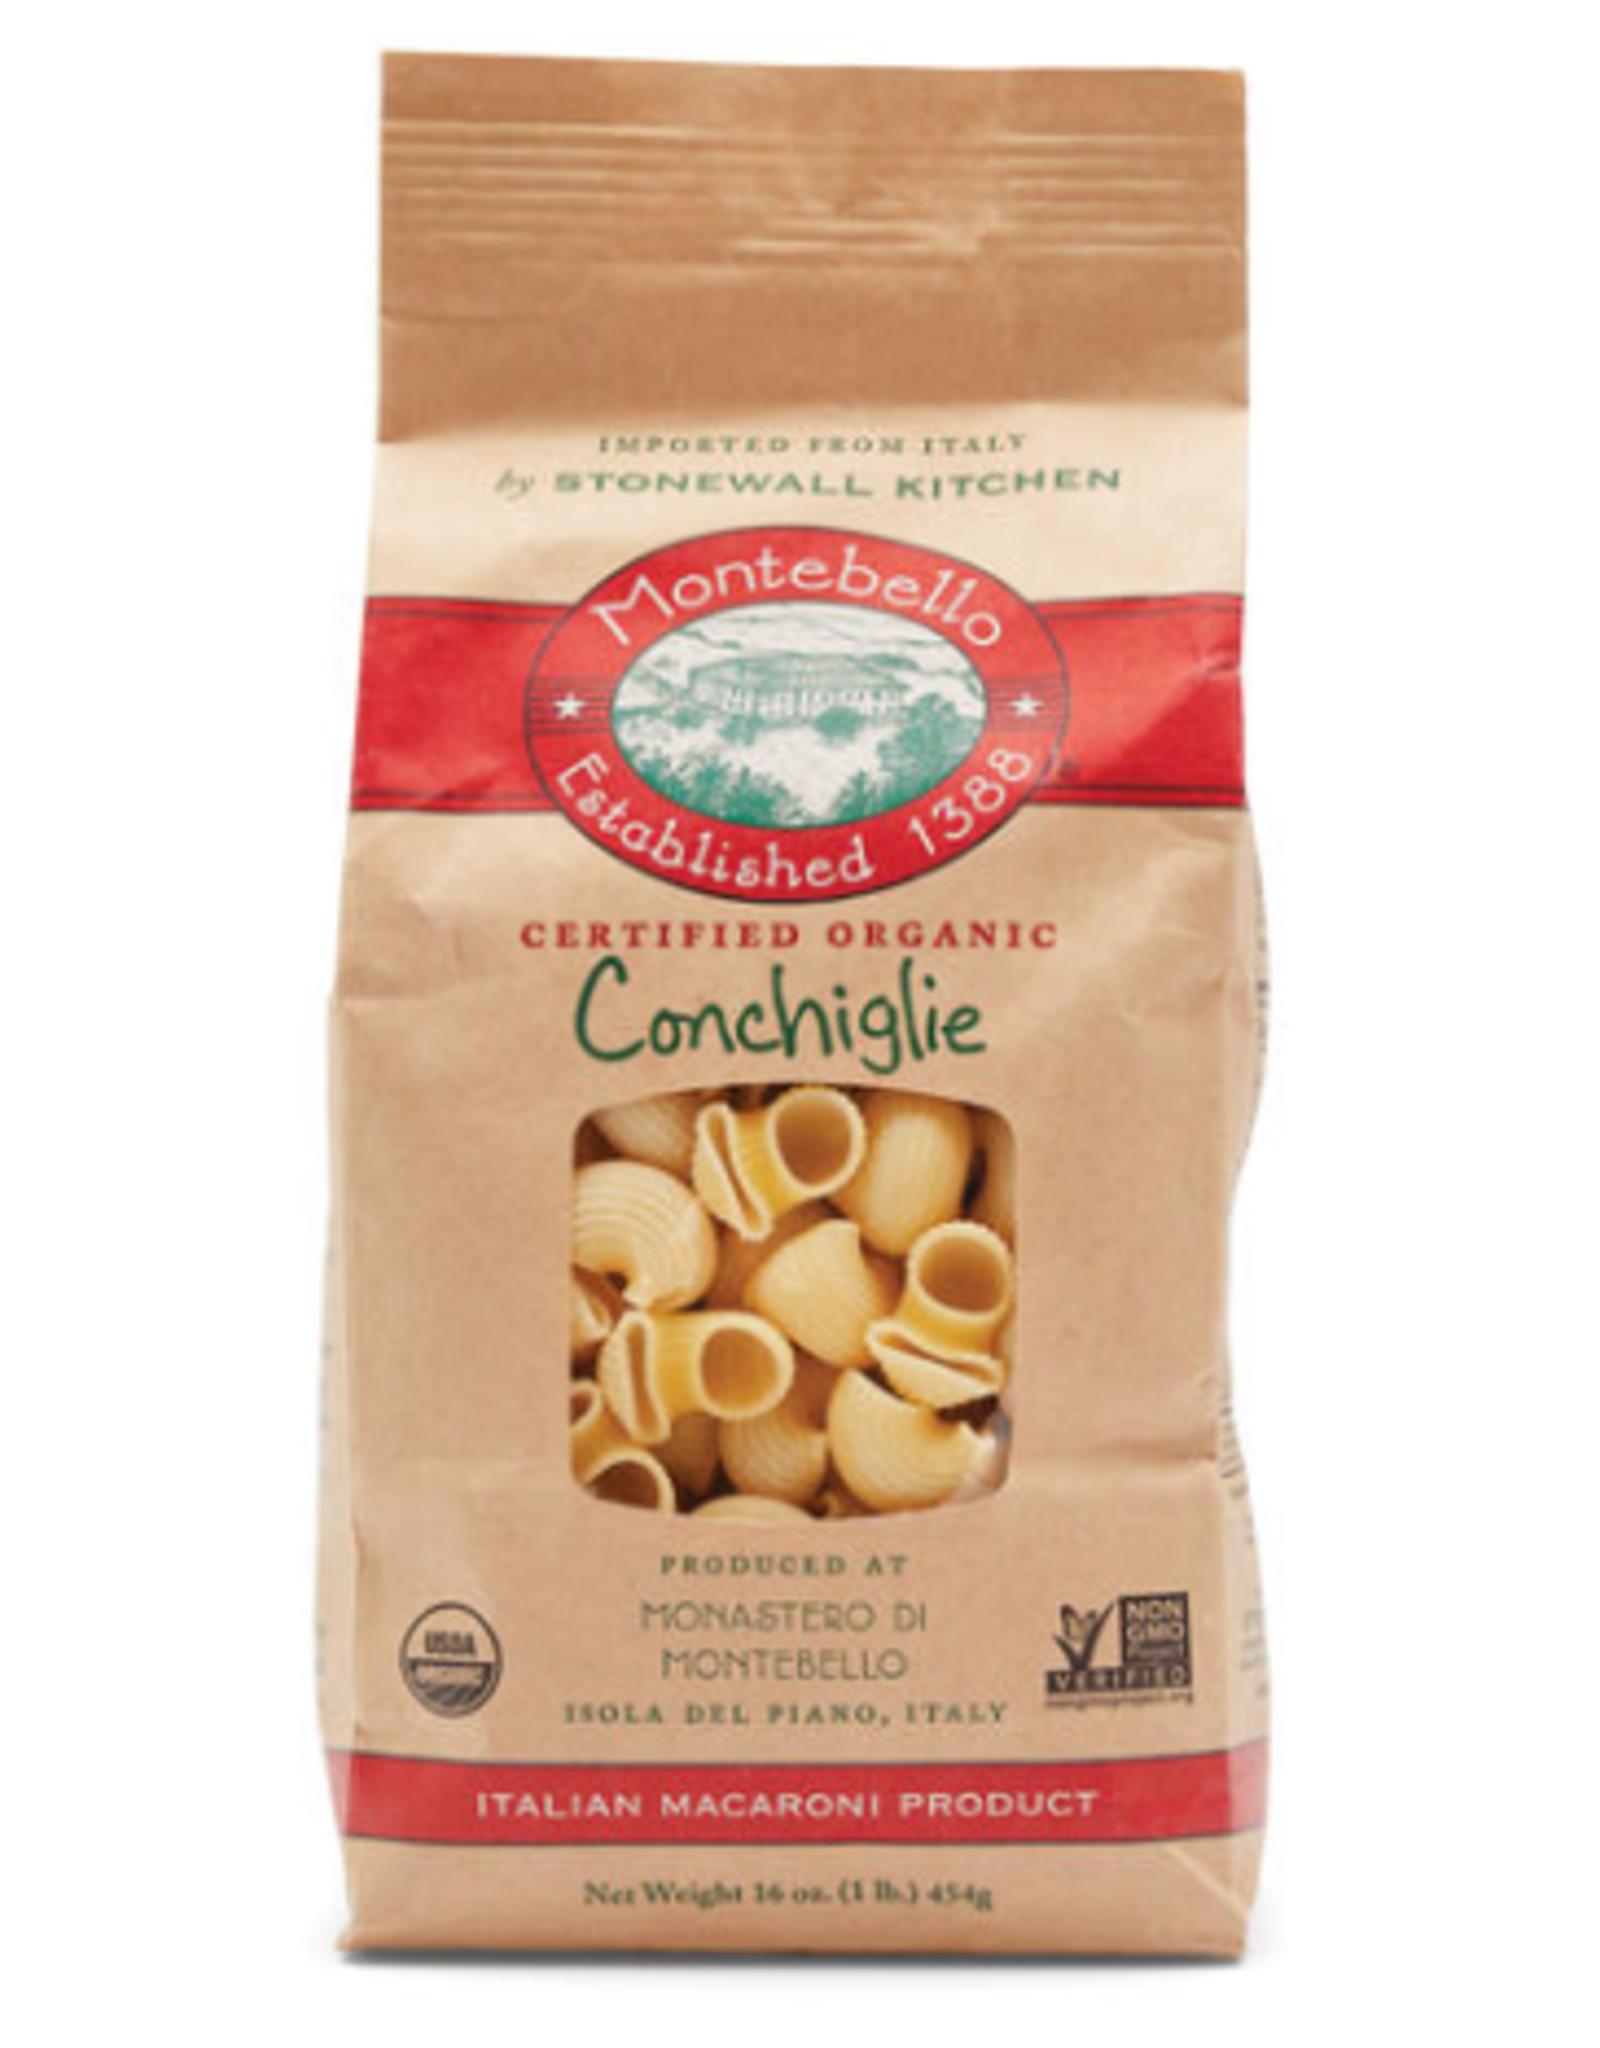 Stonewall Kitchen Conchiglie Organic Pasta Montebello